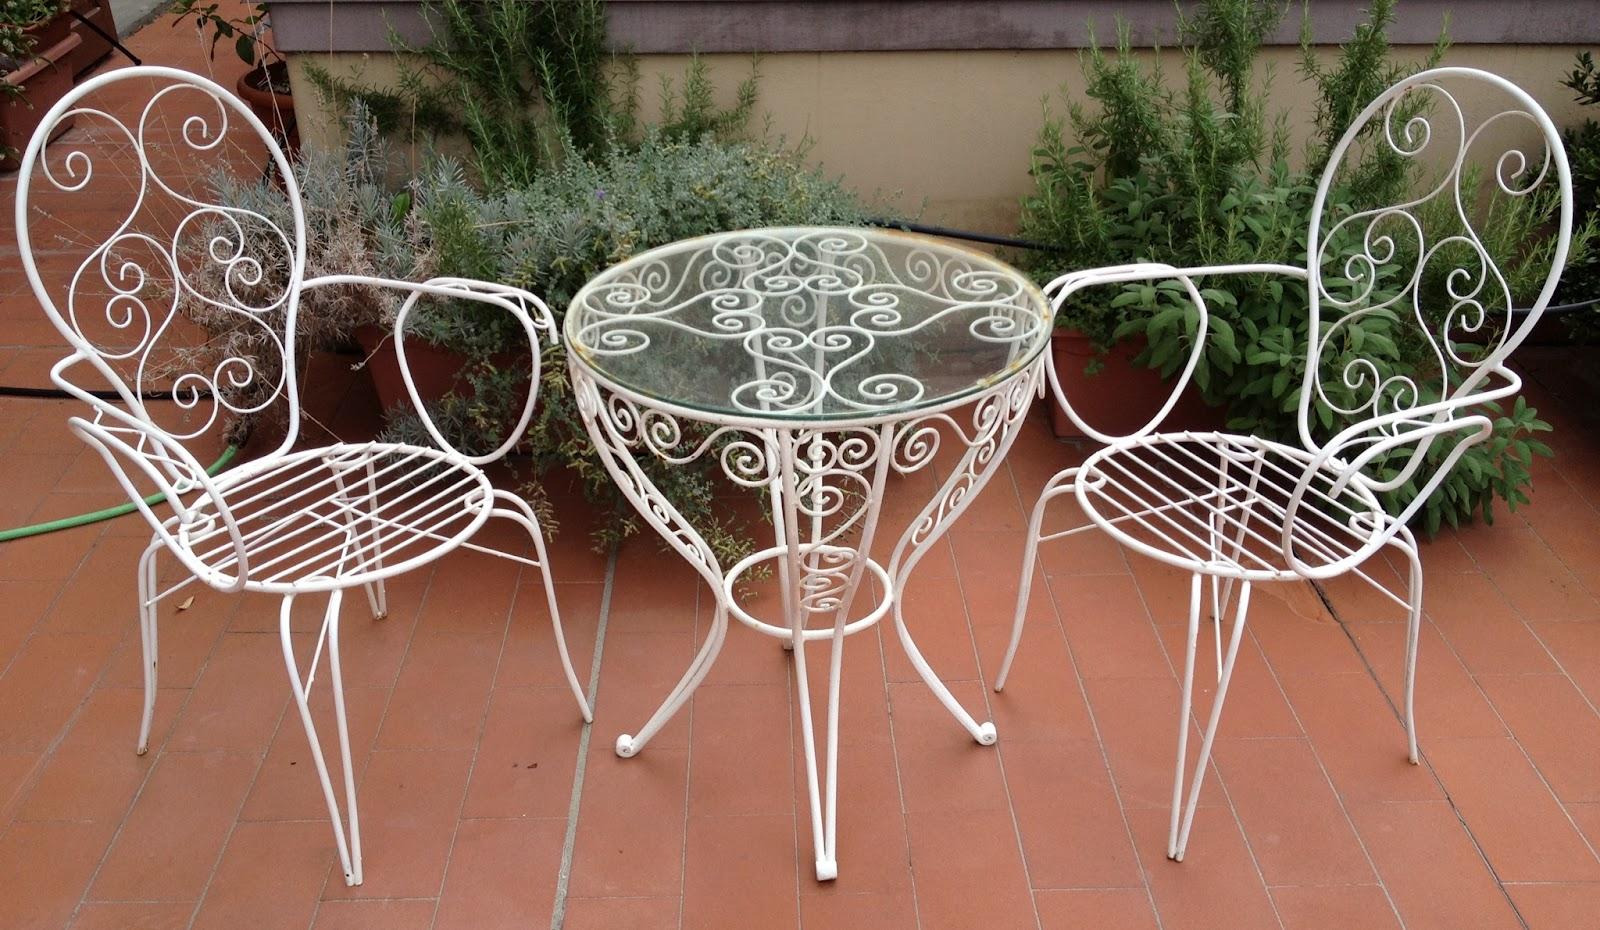 Blanca e fulvio traslocano 09 15 12 - Tavolino da giardino ikea ...